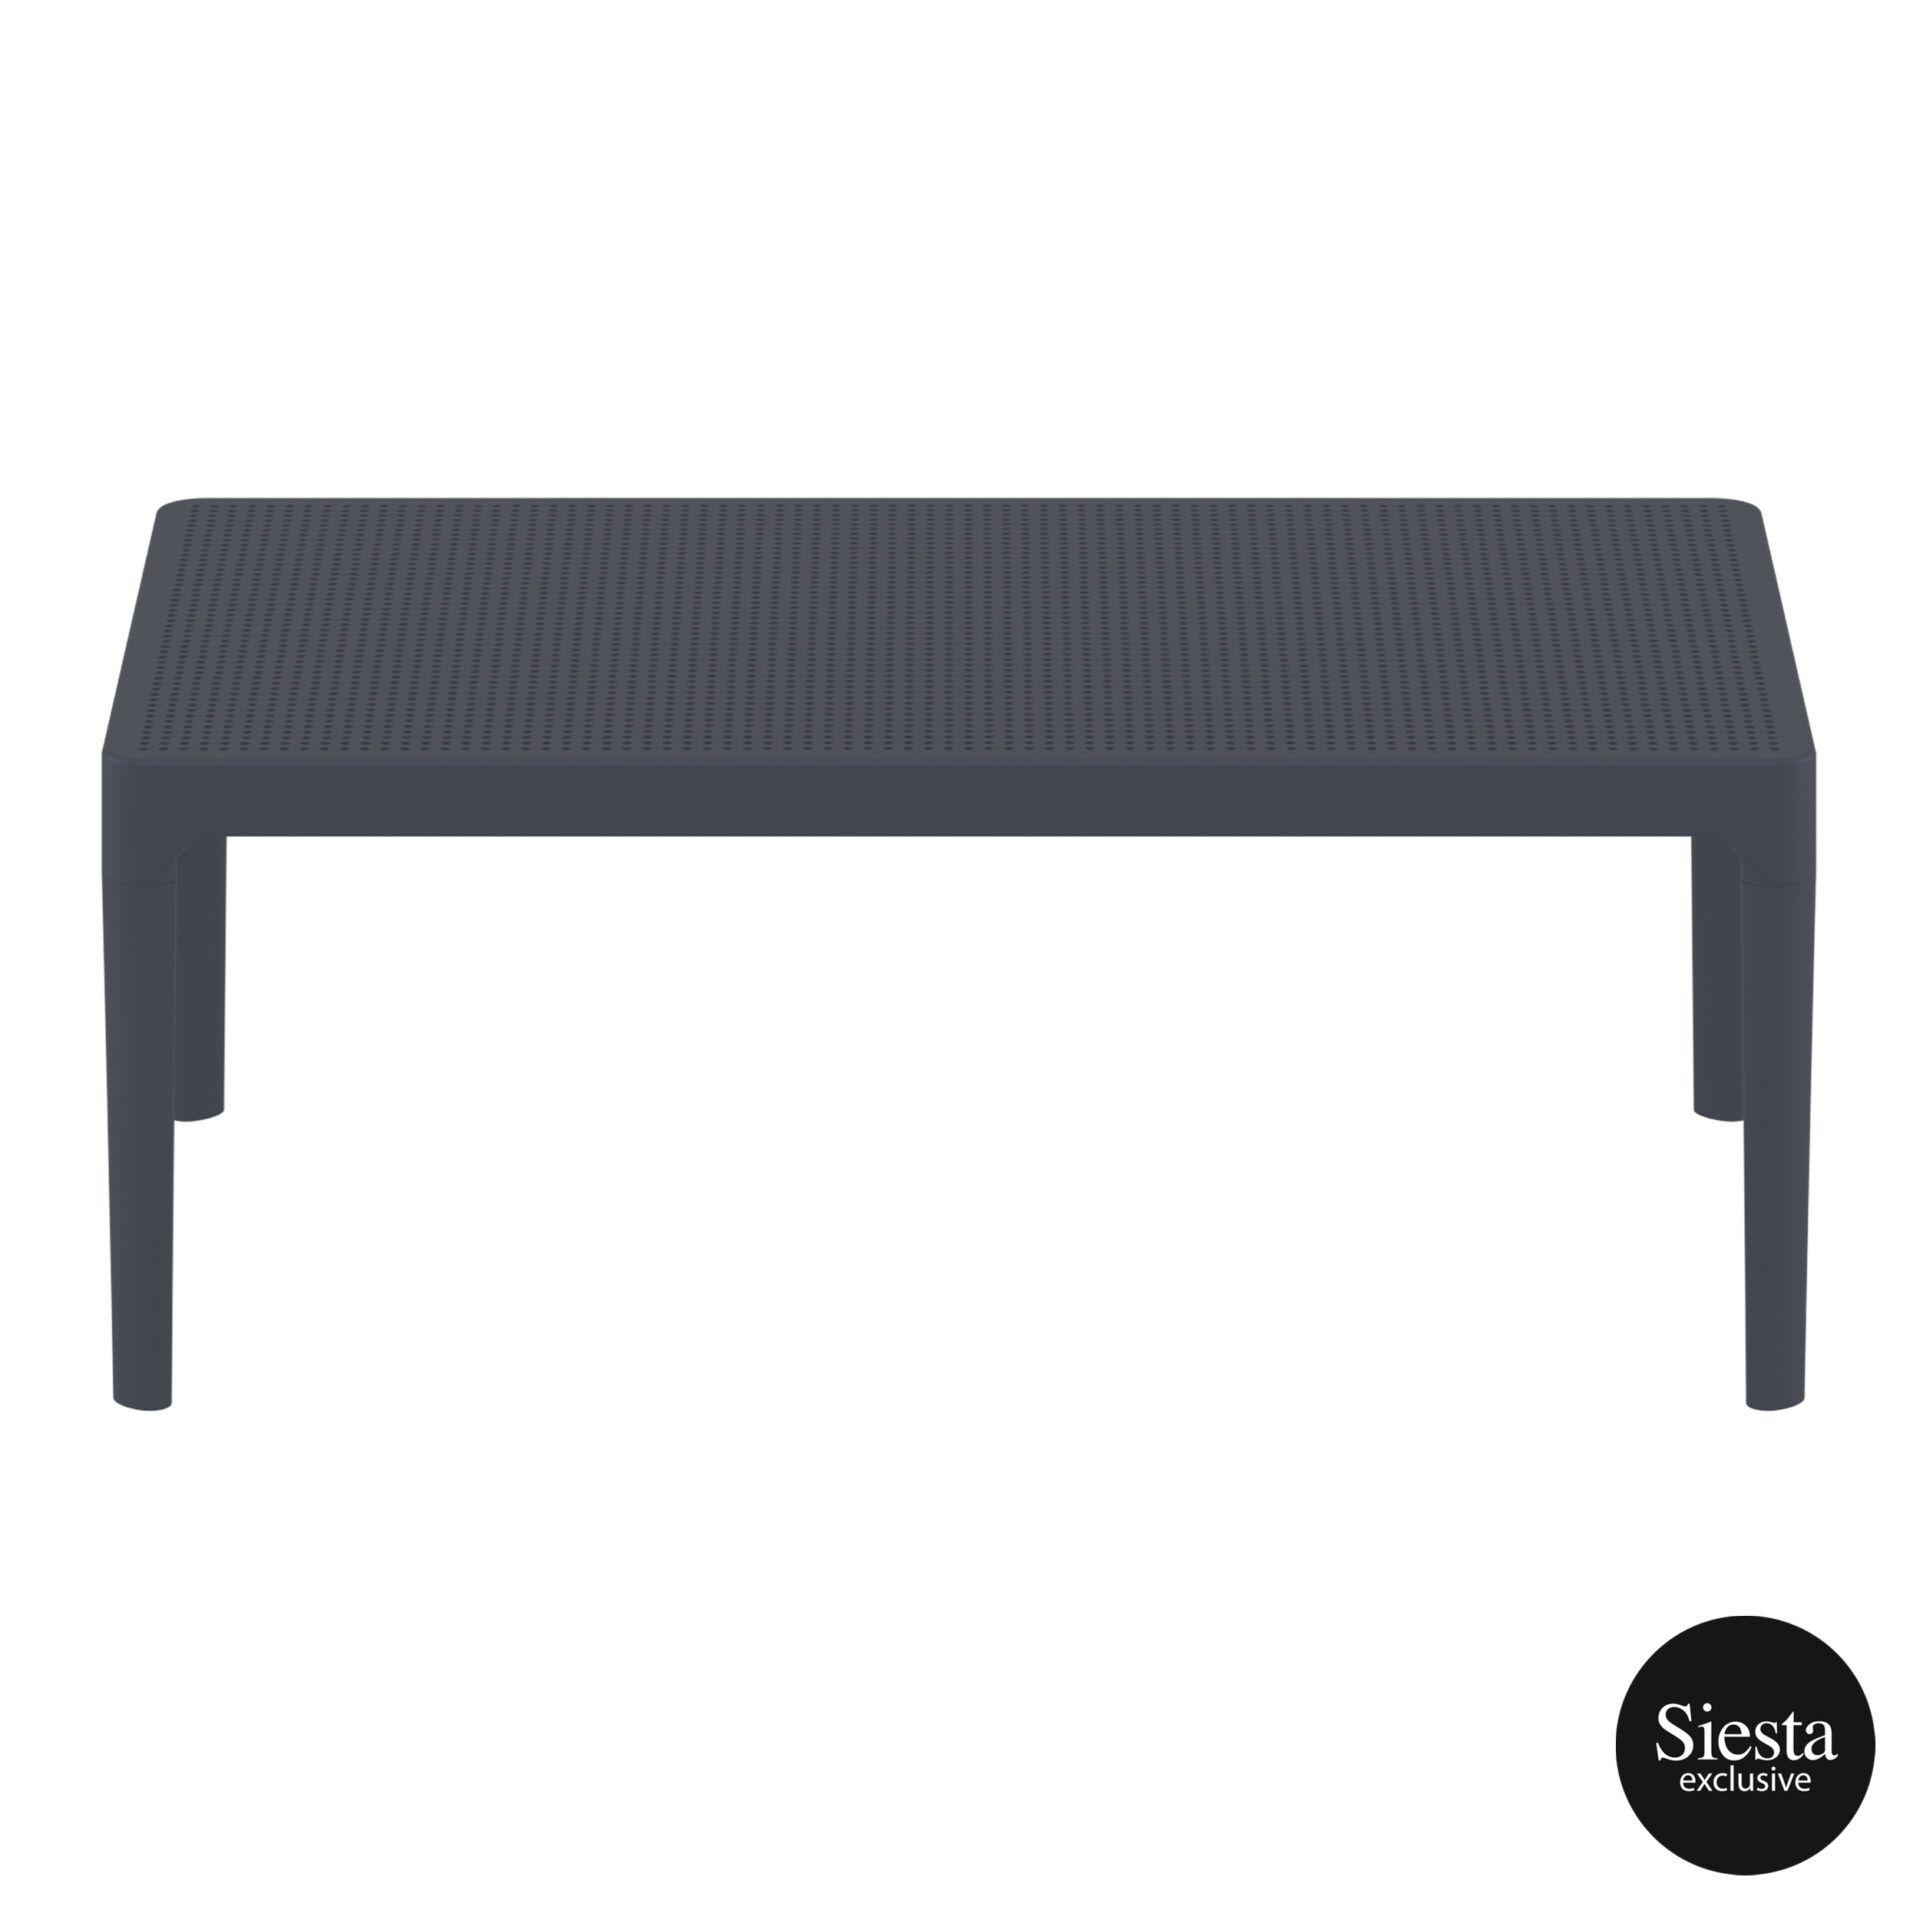 polypropylene outdoor sky lounge coffee table darkgrey long edge 2